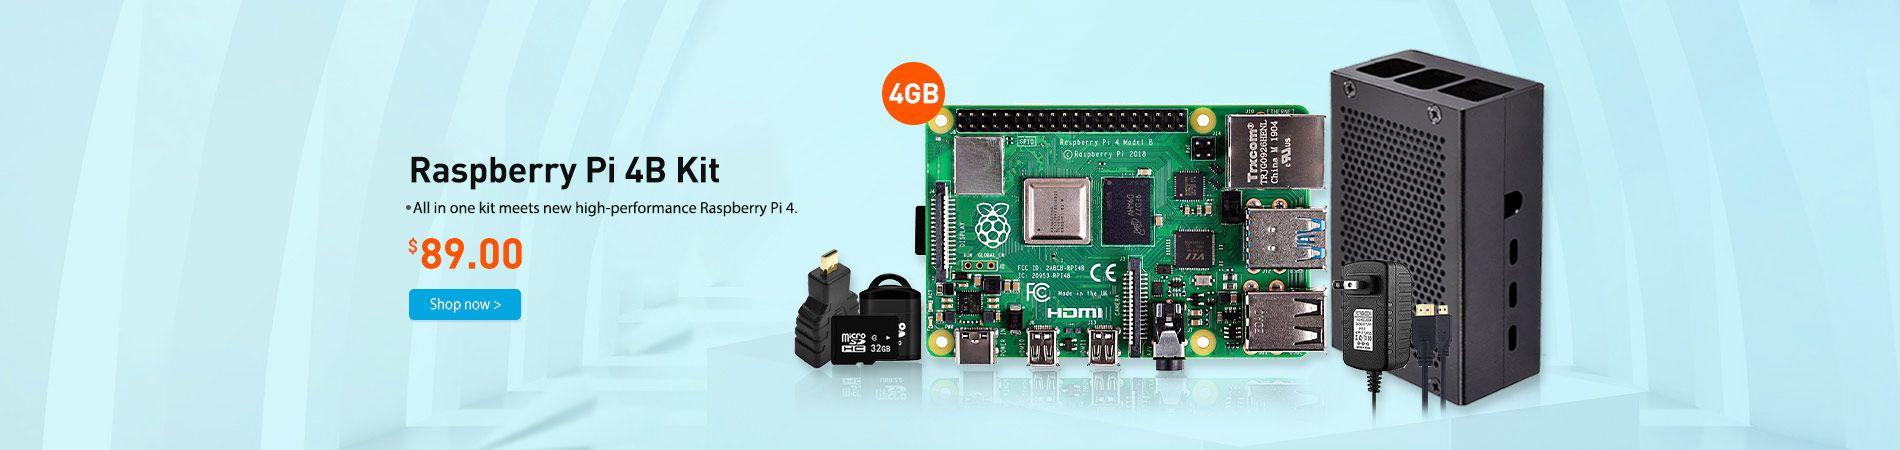 /raspberry-pi-4-model-b-with-4gb-ram.html